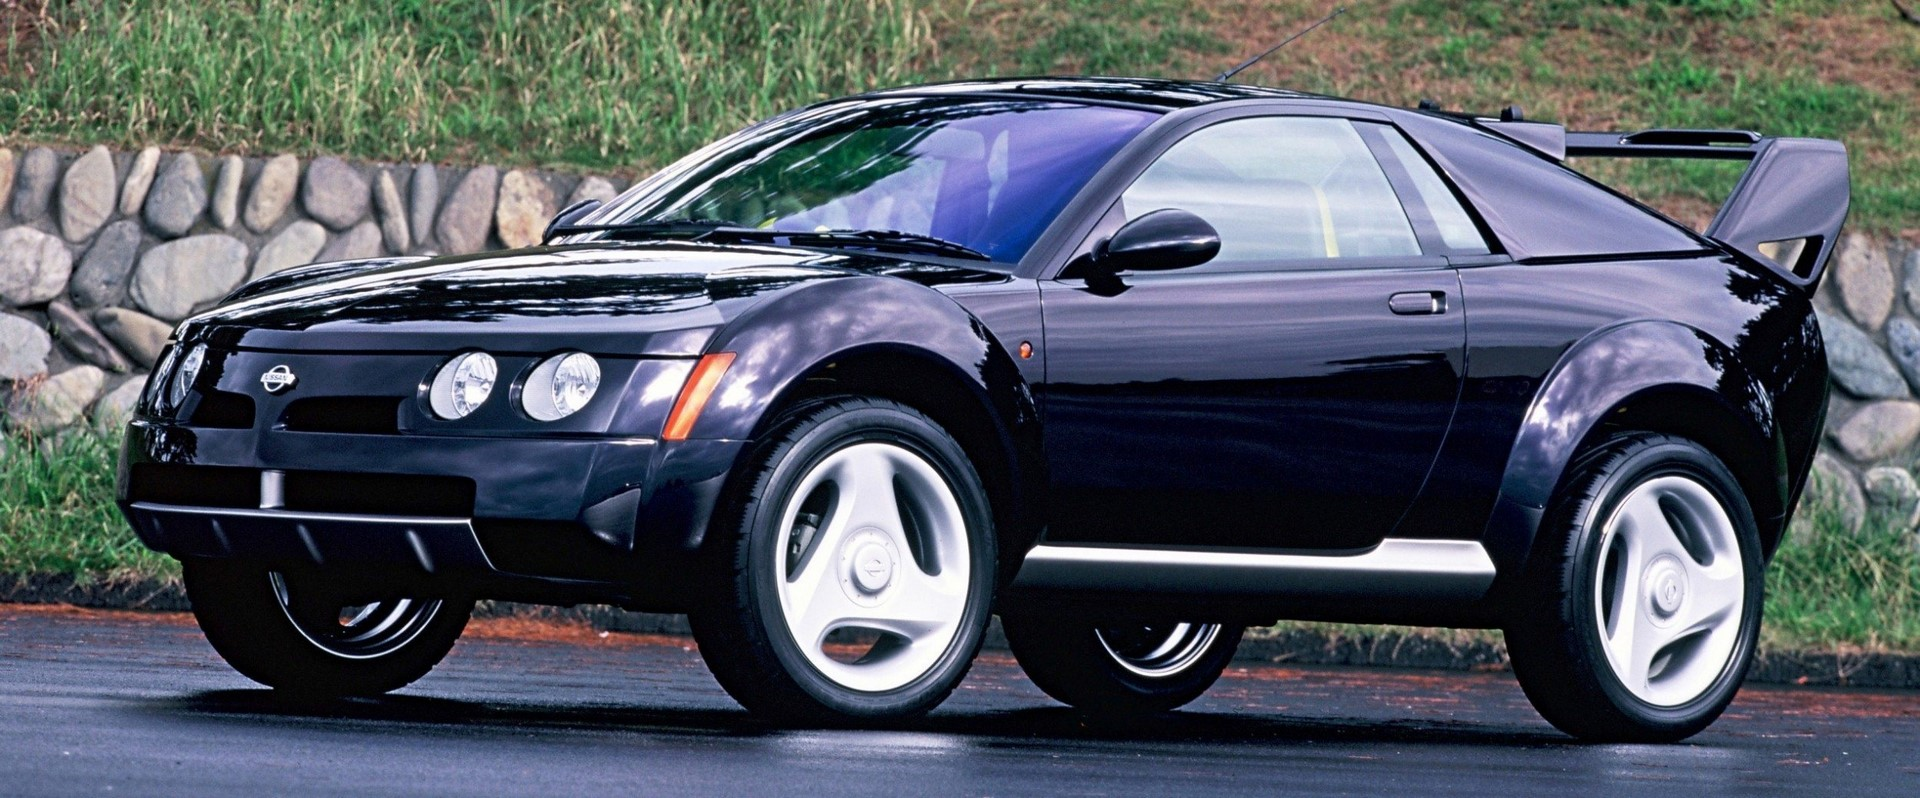 Nissan Trail Runner concept (10)